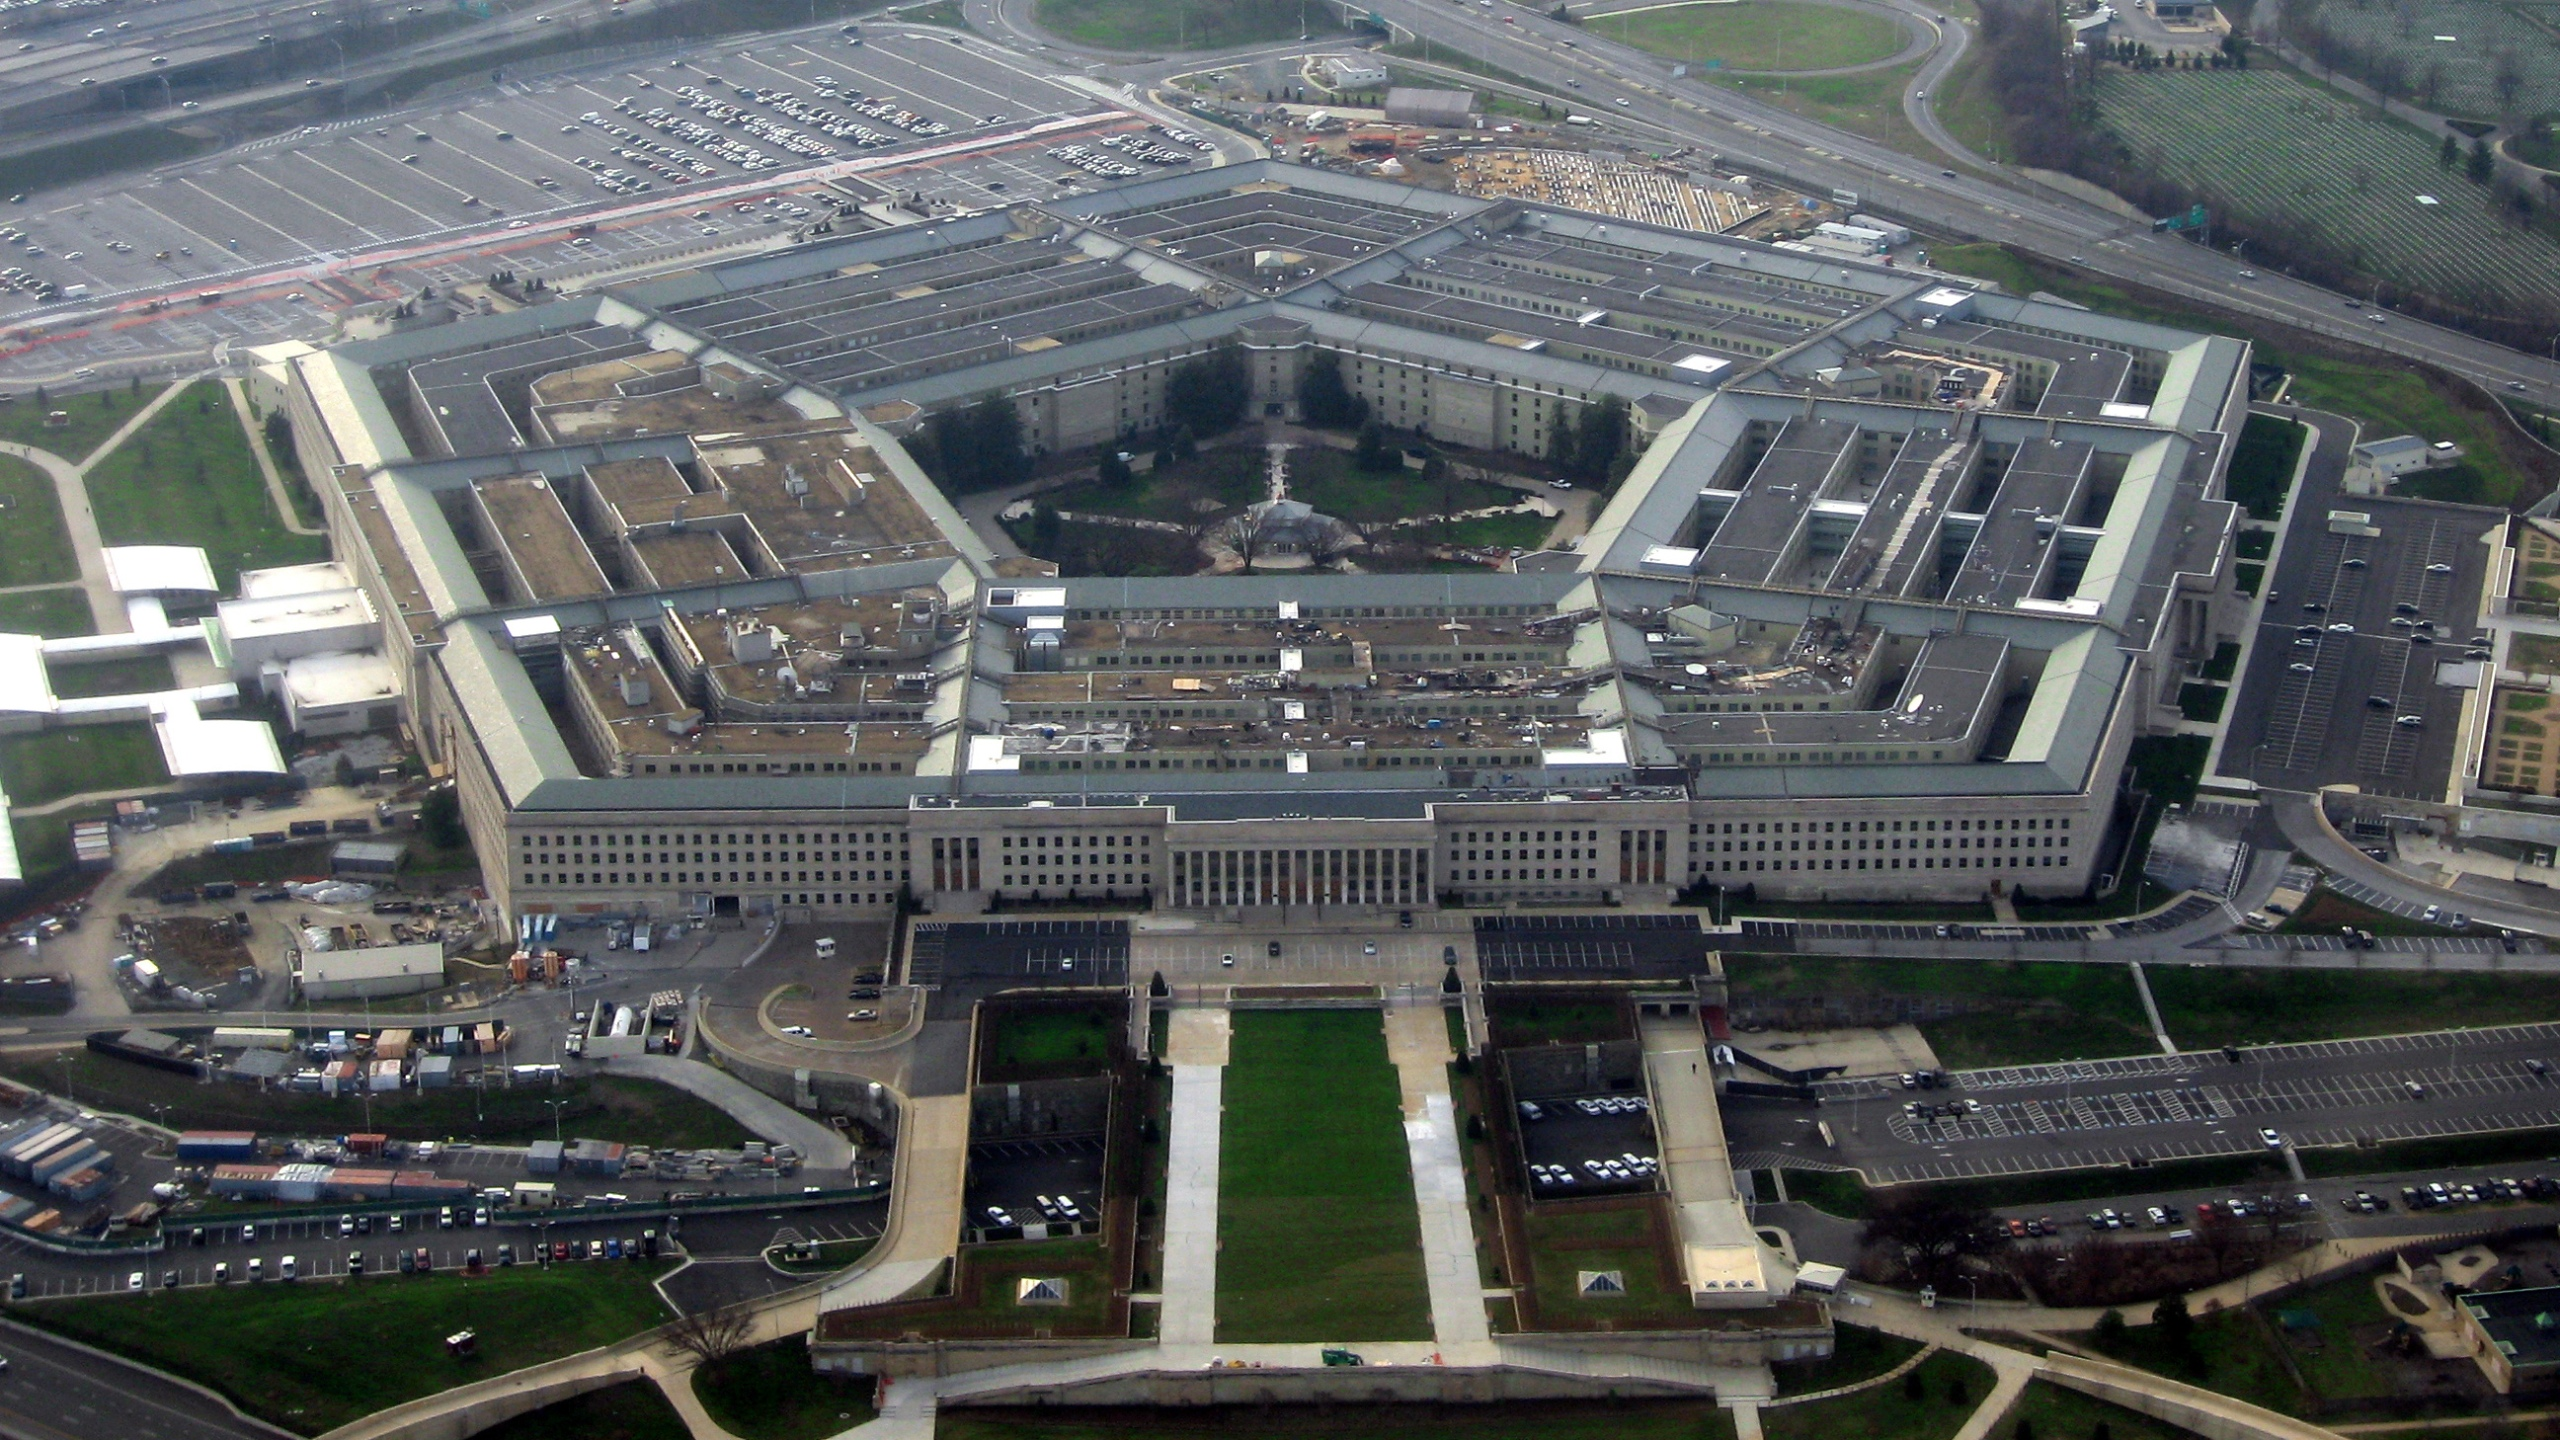 The_Pentagon_January_2008_118929